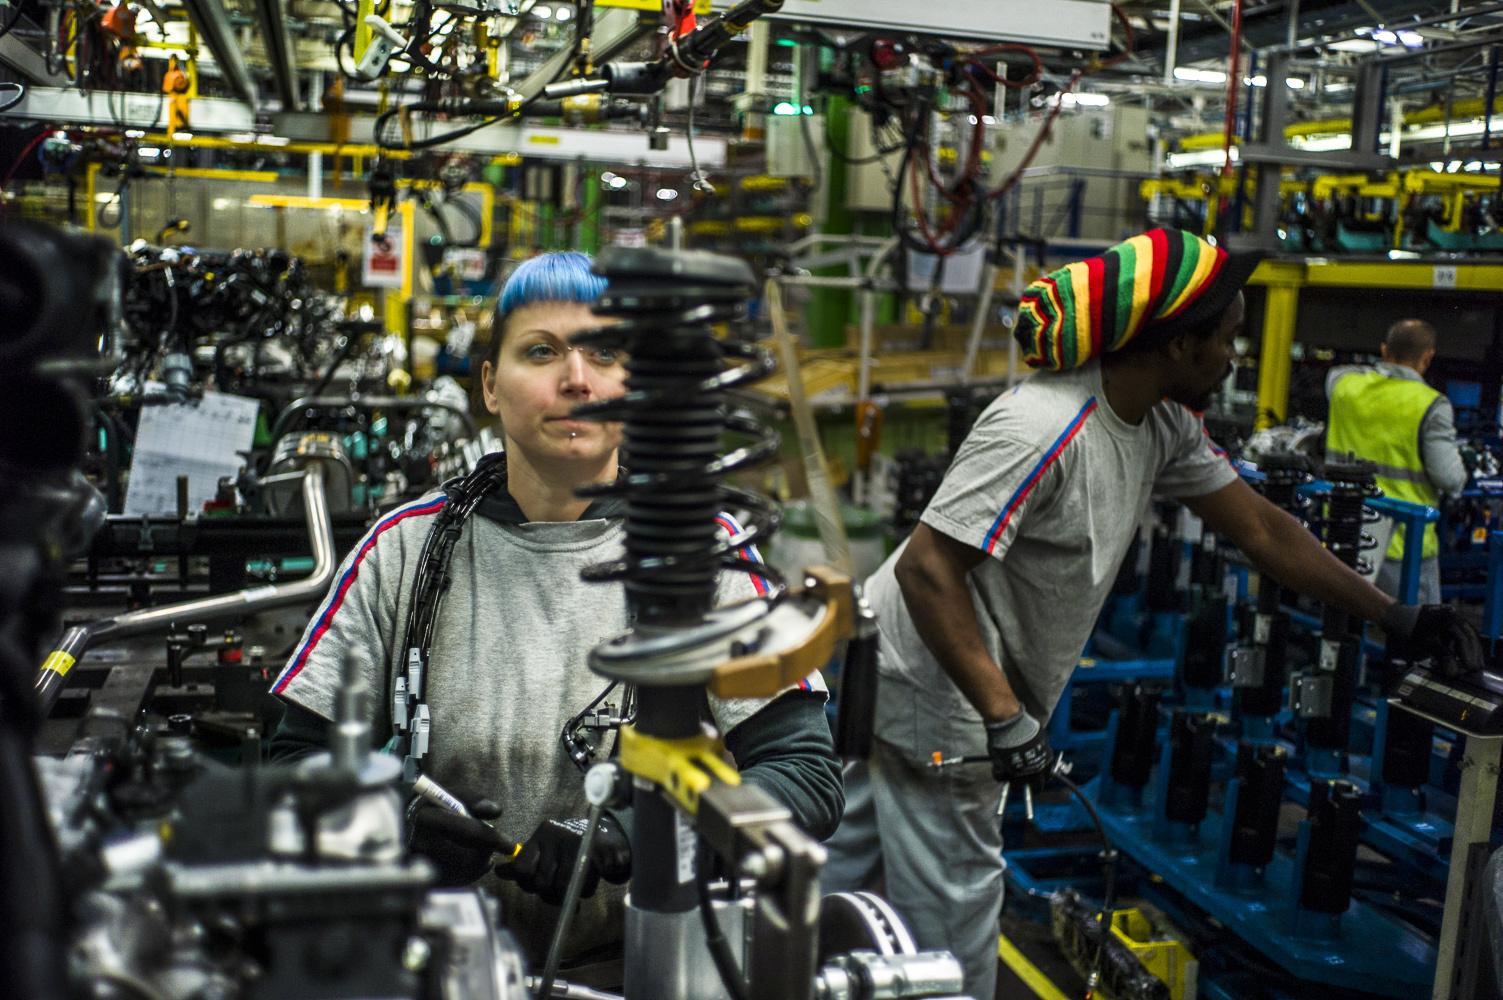 Работа на заводе конвейер шагающий конвейер шаговый конвейер